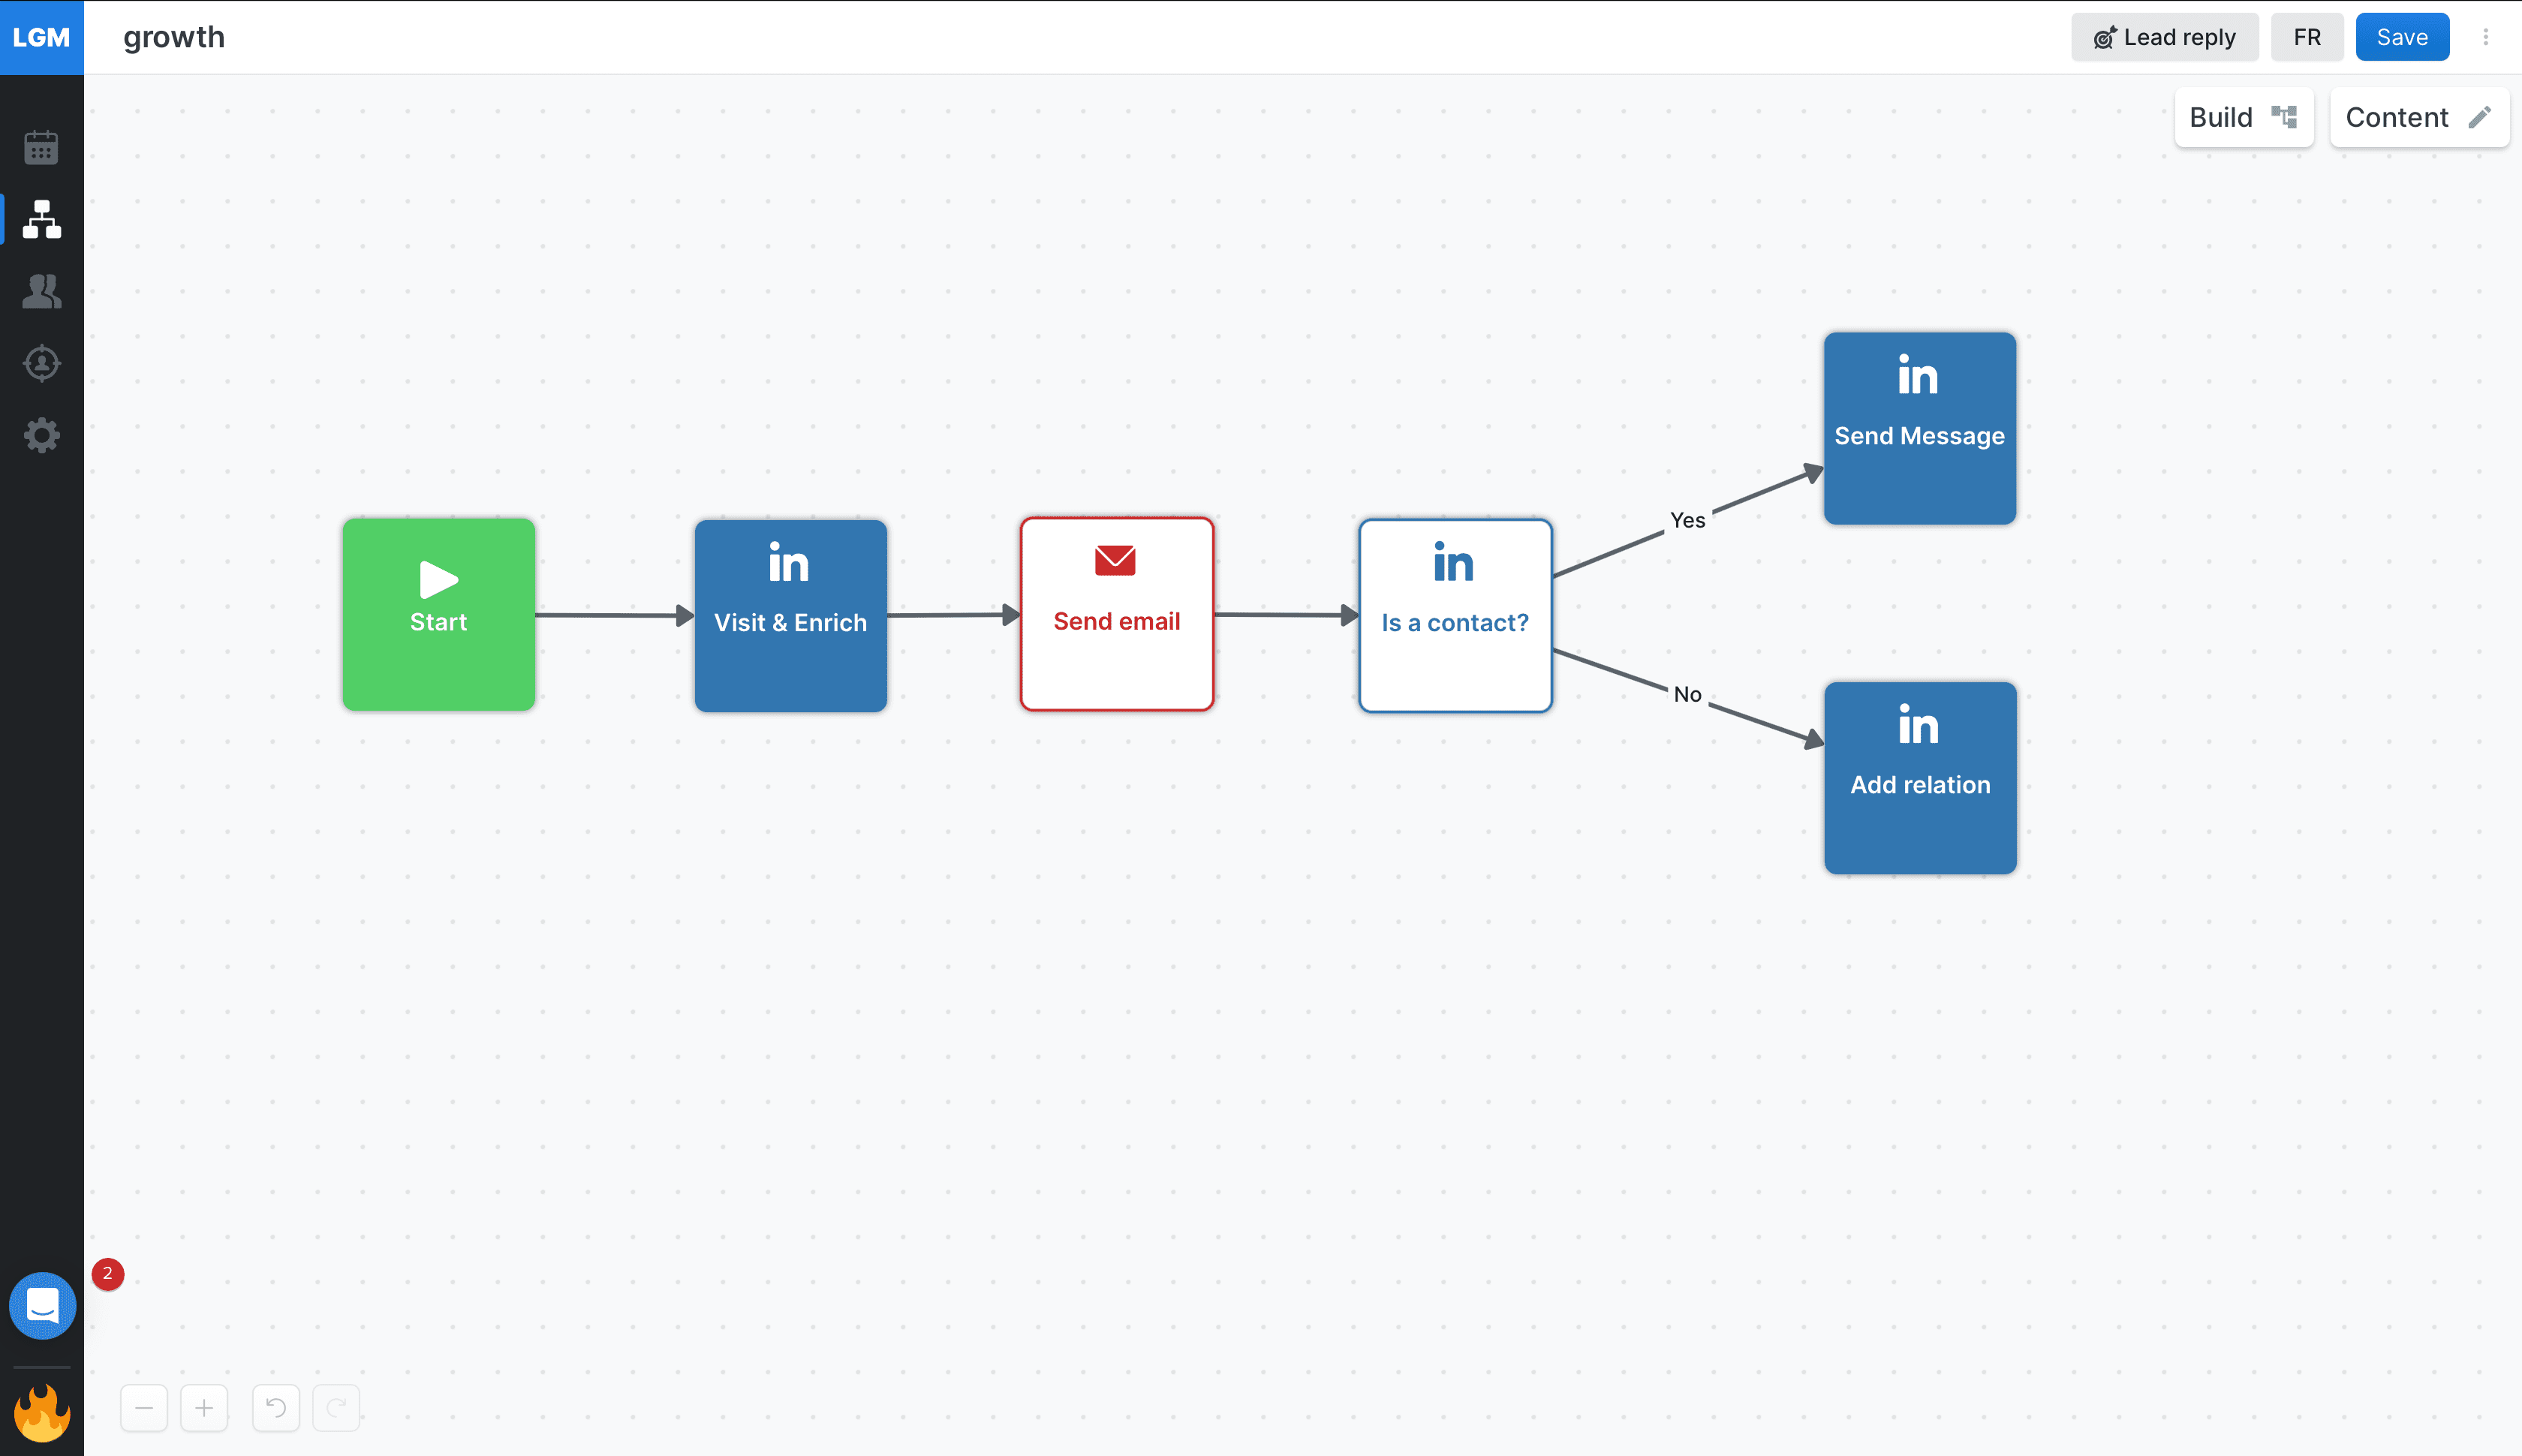 LGM : La Growth Machine : sales automation tool